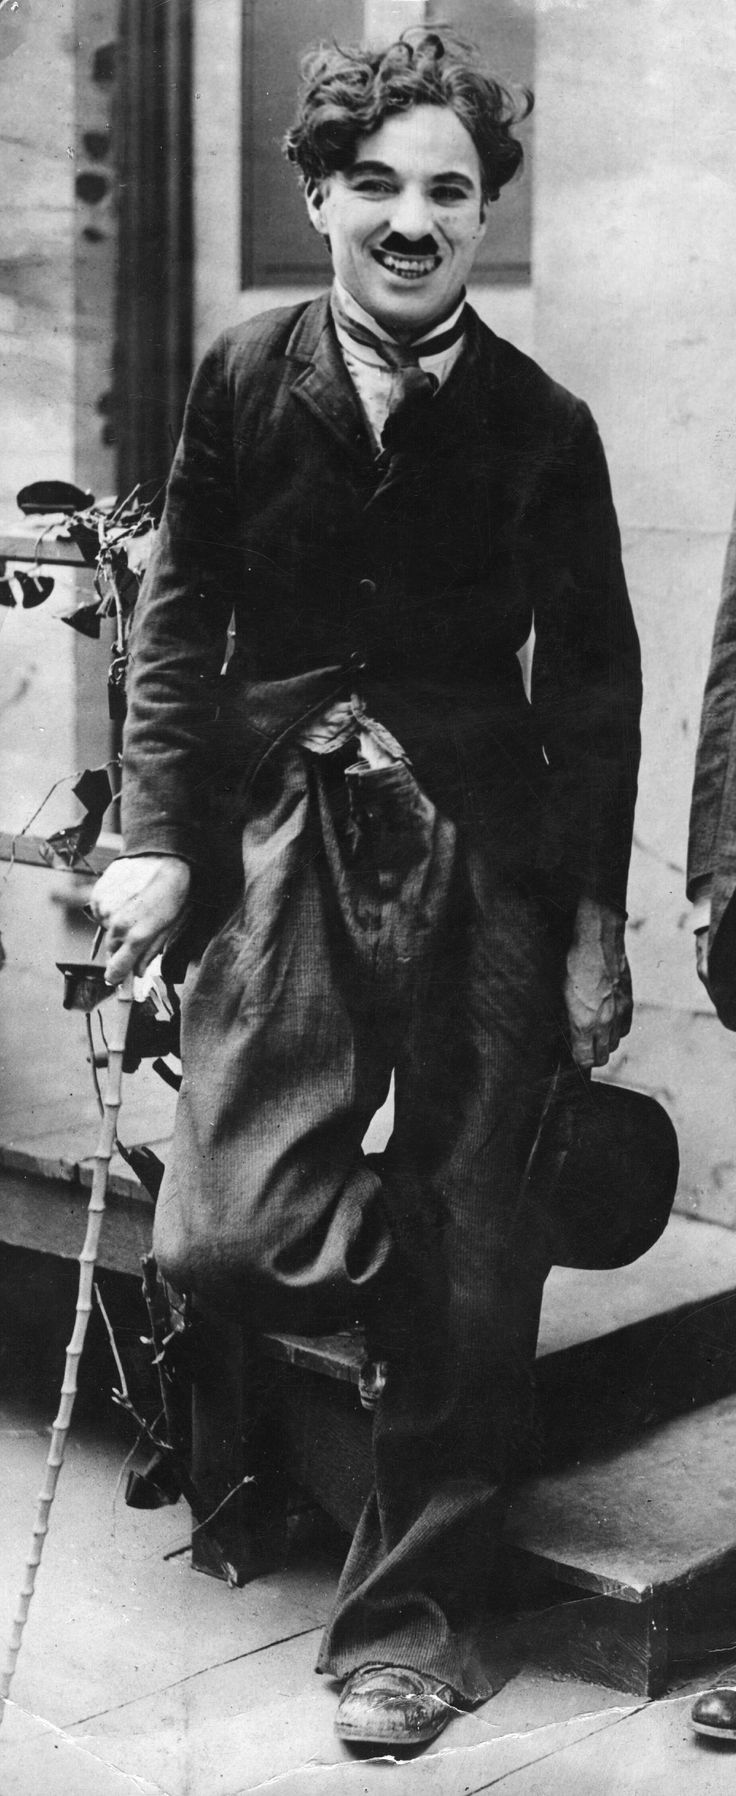 Charlie Chaplin | The SF Silent Film Festival | Charlie Chaplin Centennial Celebration January 11th 2014 @ the Castro Theatre